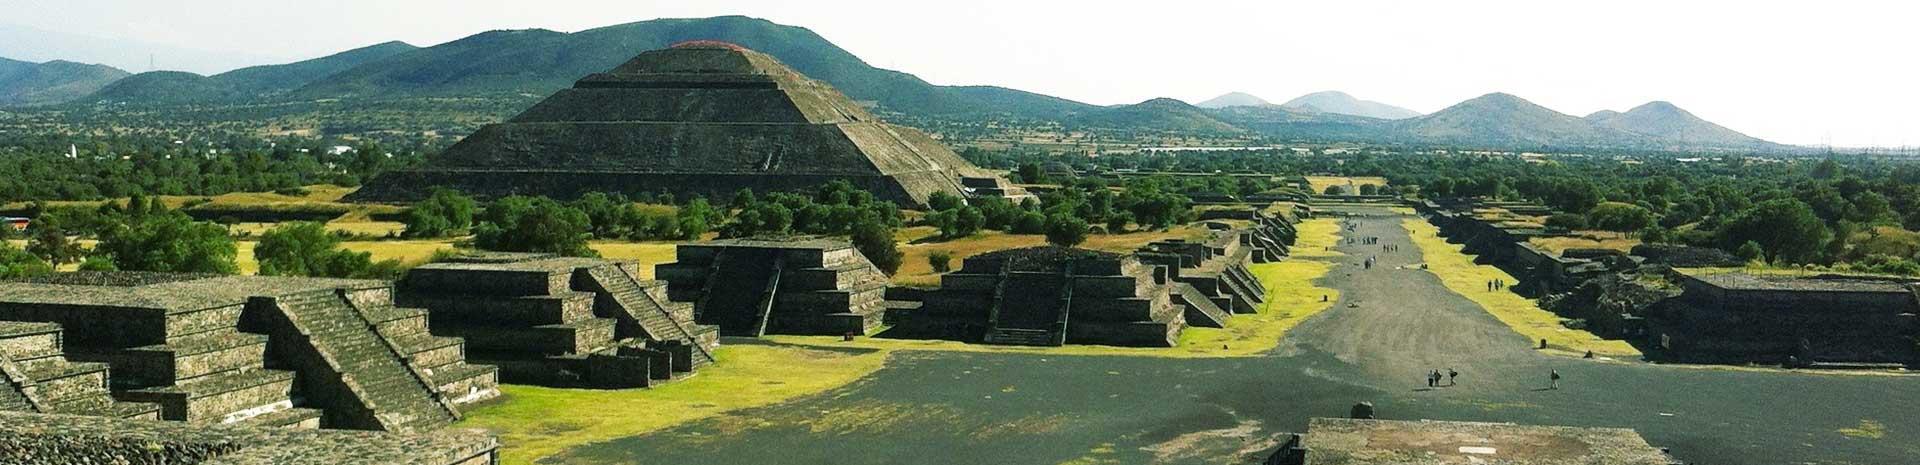 sacesimest-Messico-USMCA-accordi commerciali-export